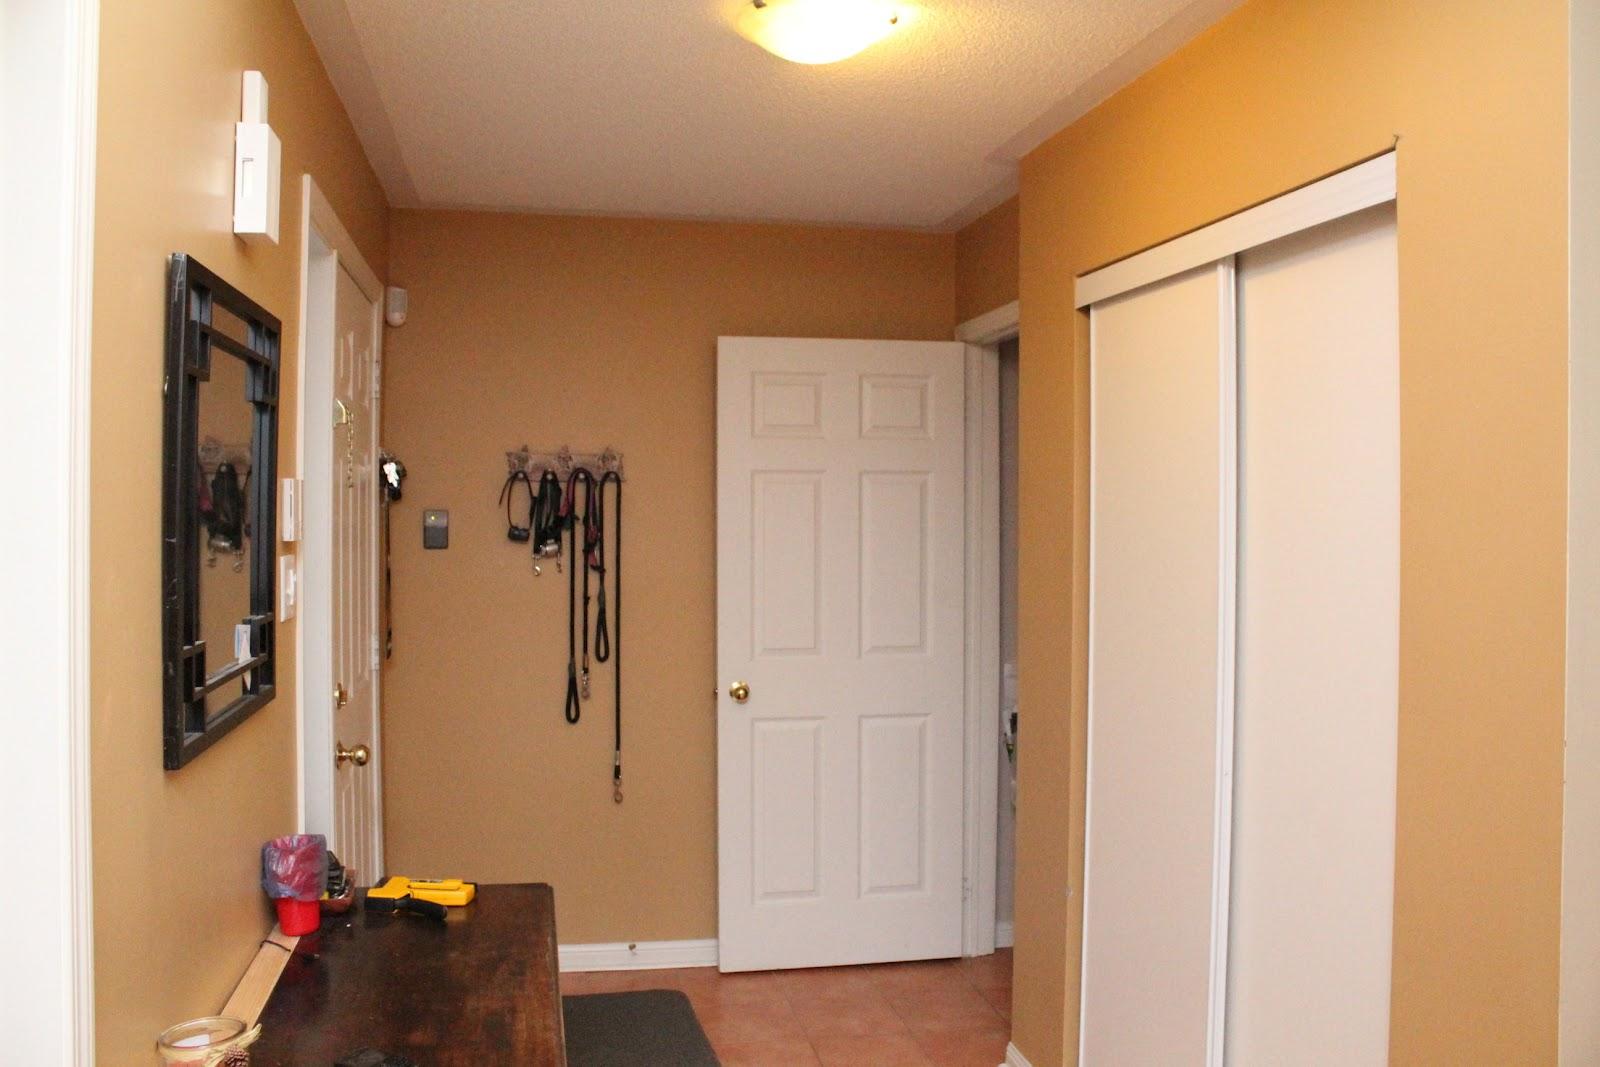 Installing Bi-Fold Doors - Foyer Reveal & Turtles and Tails: Installing Bi-Fold Doors - Foyer Reveal